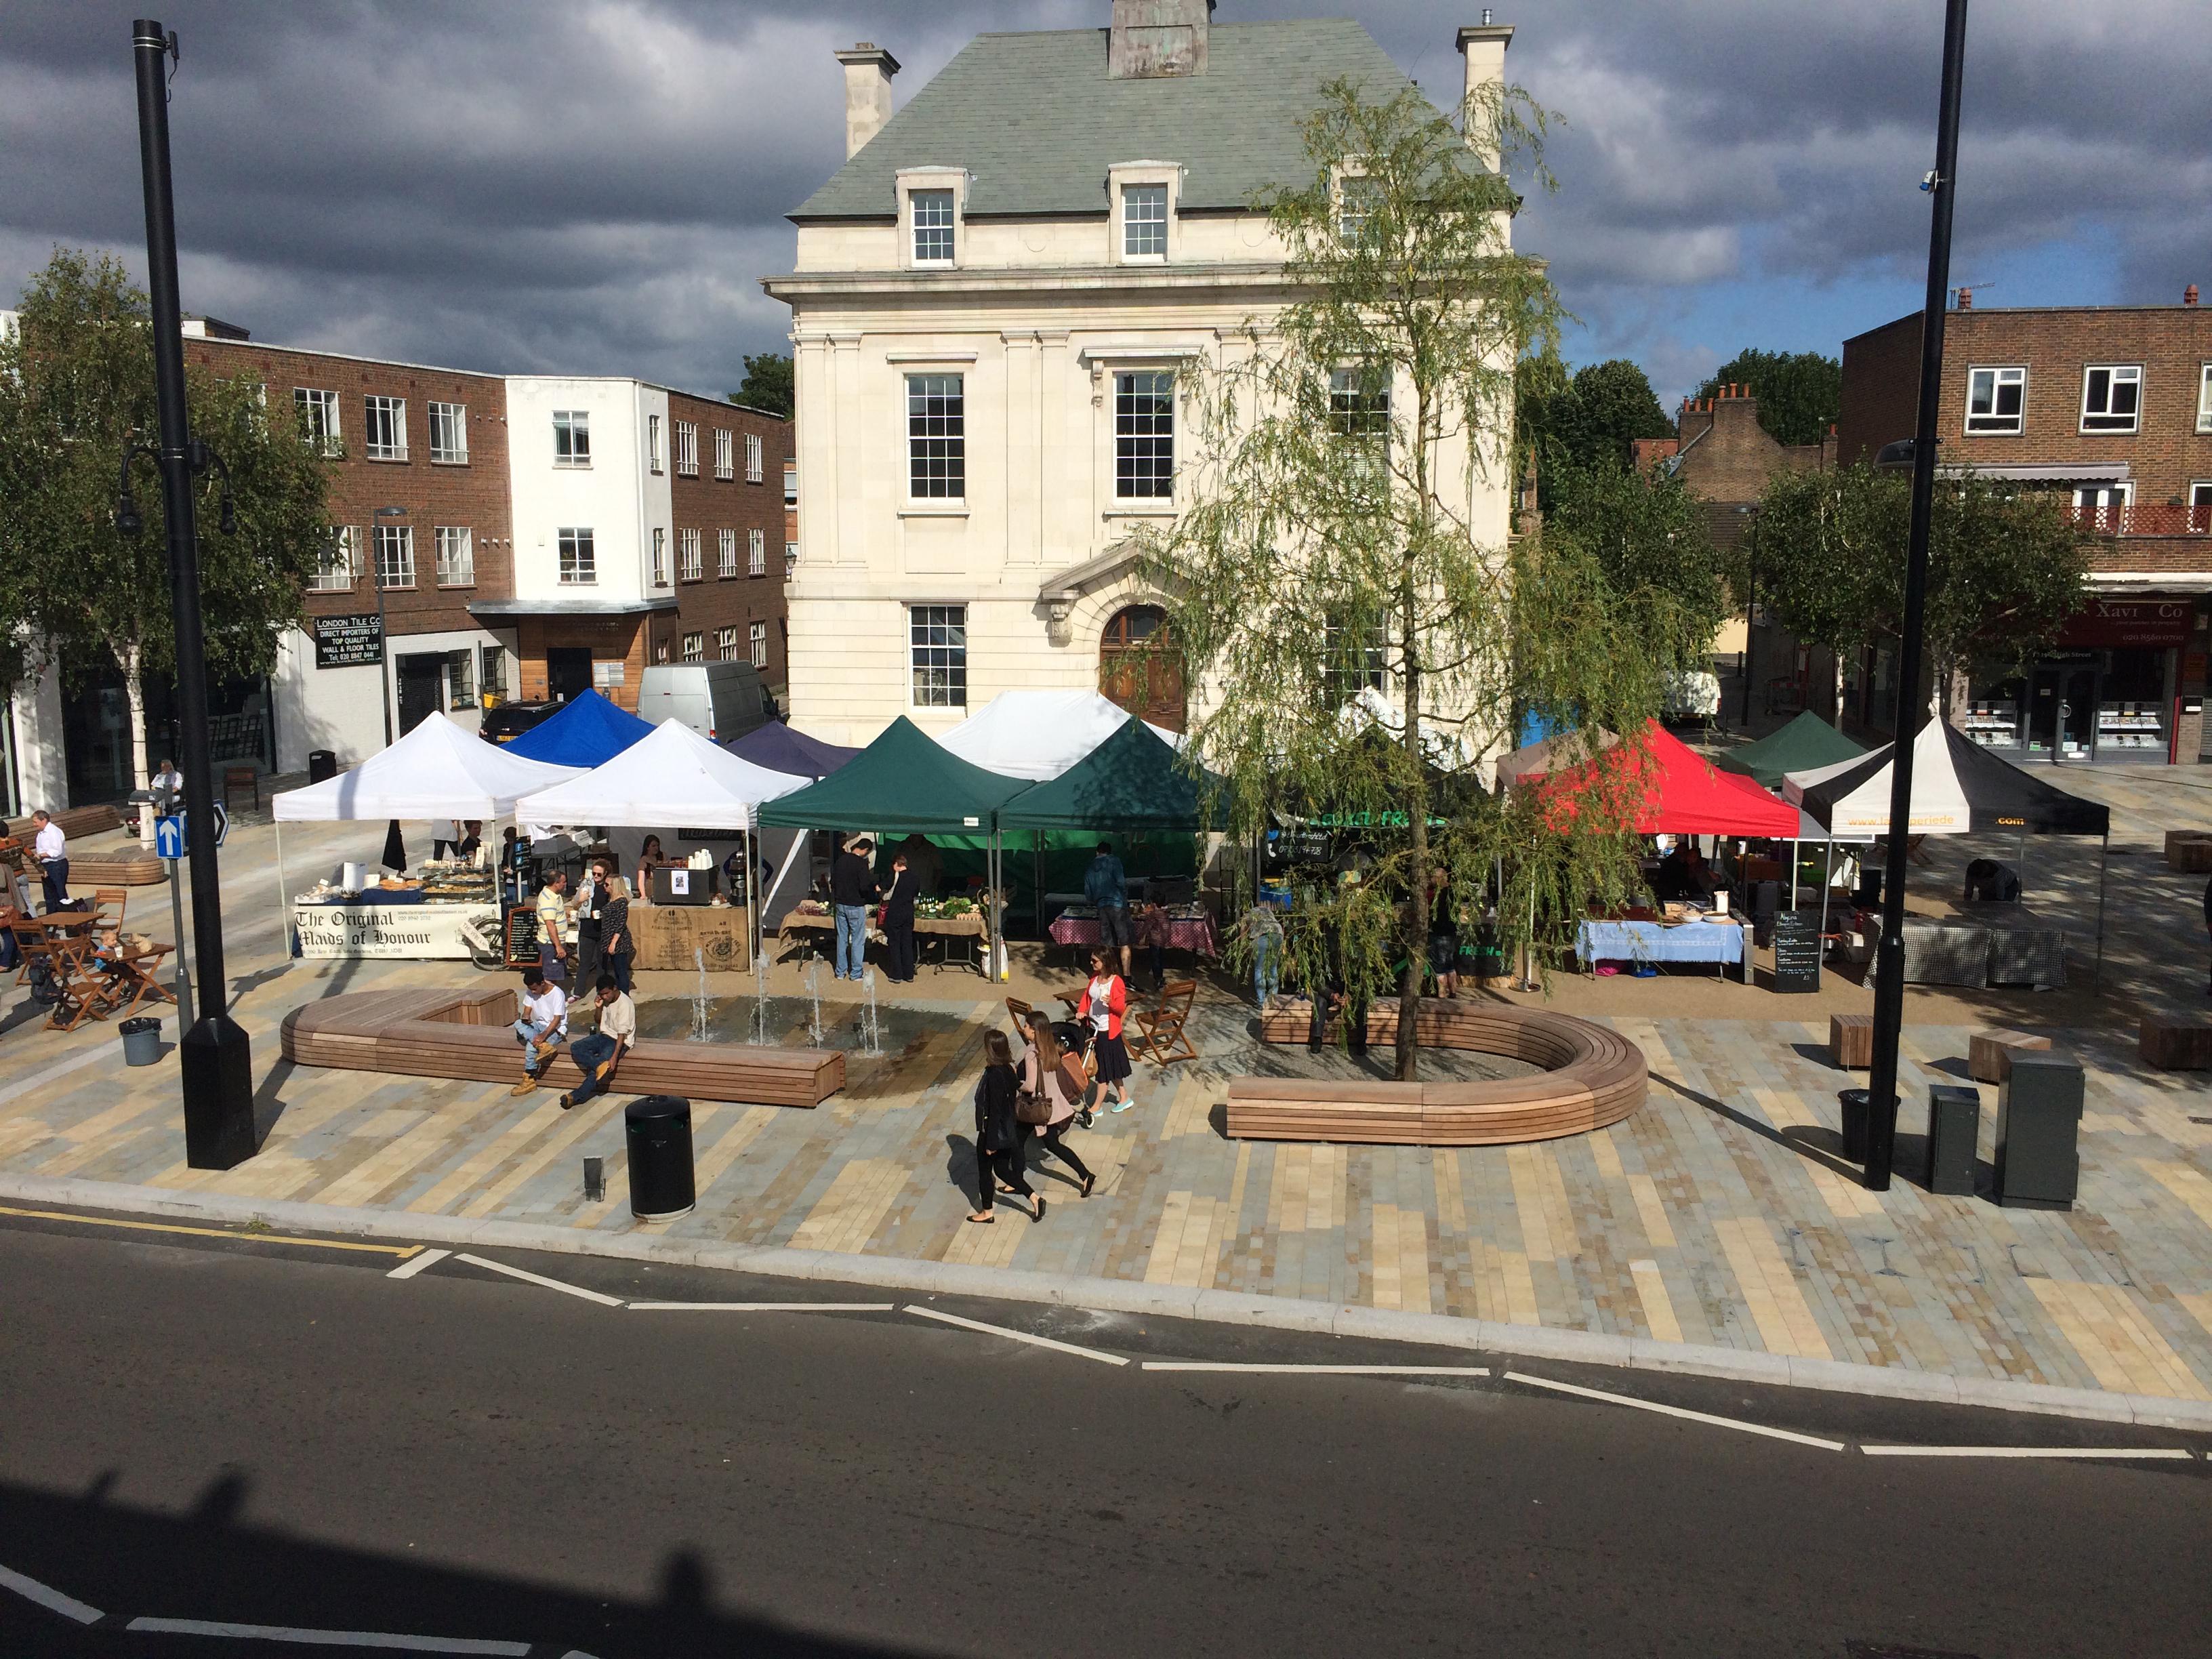 Brentford Market Square